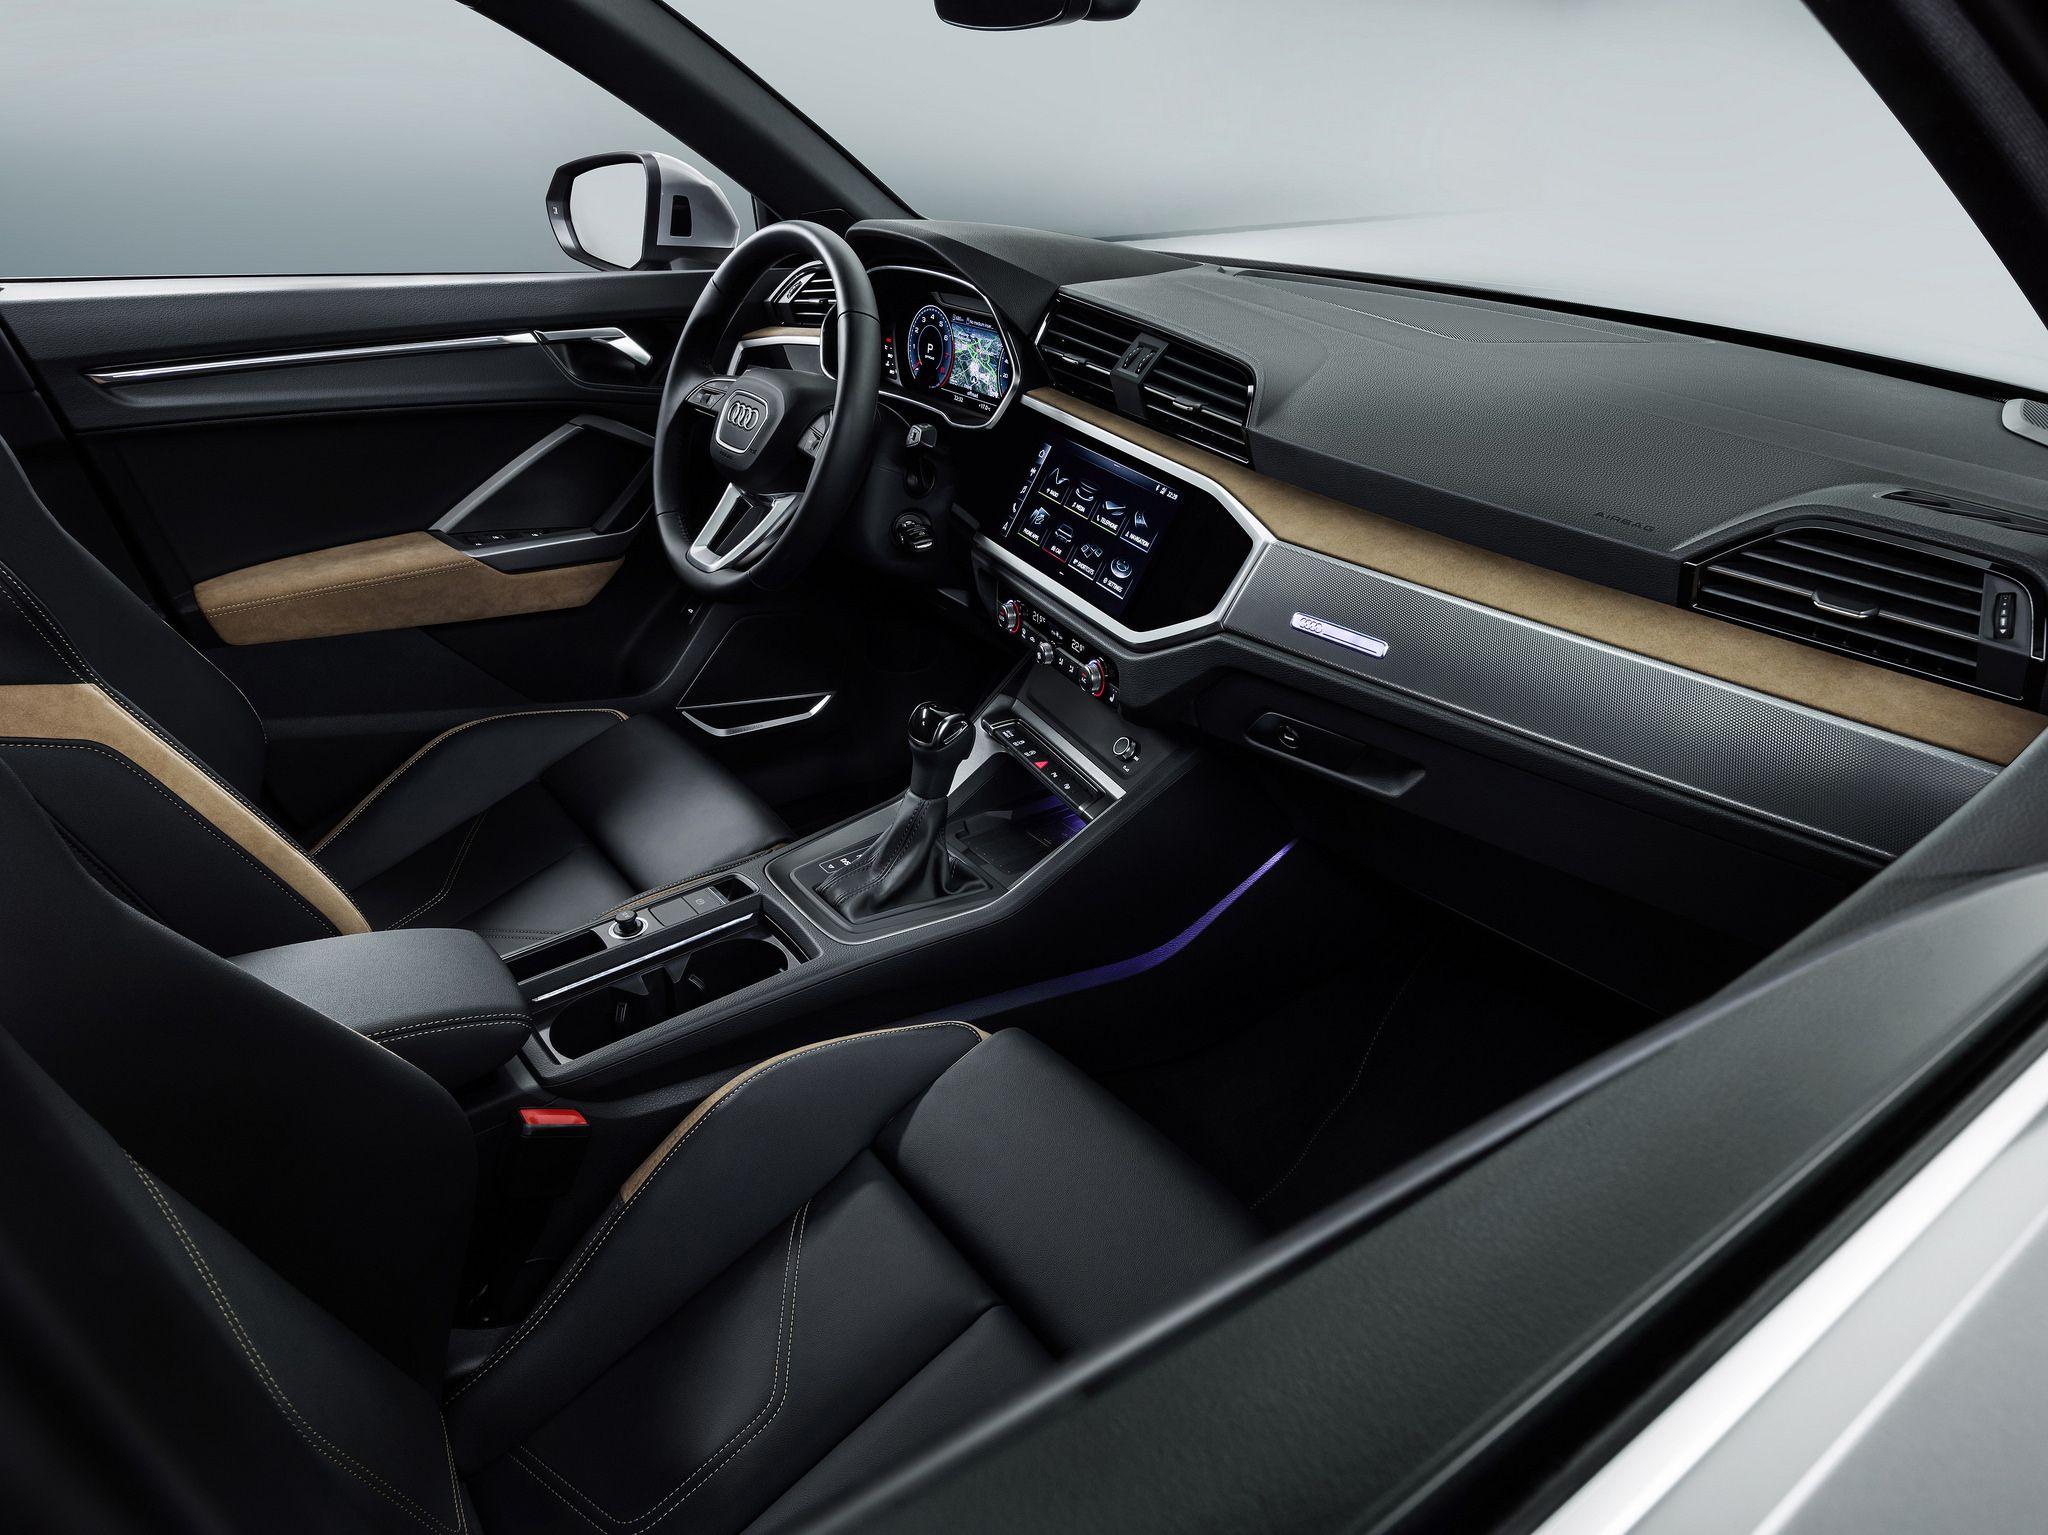 Audi Q3 Audi Q3 Audi Audi Q4